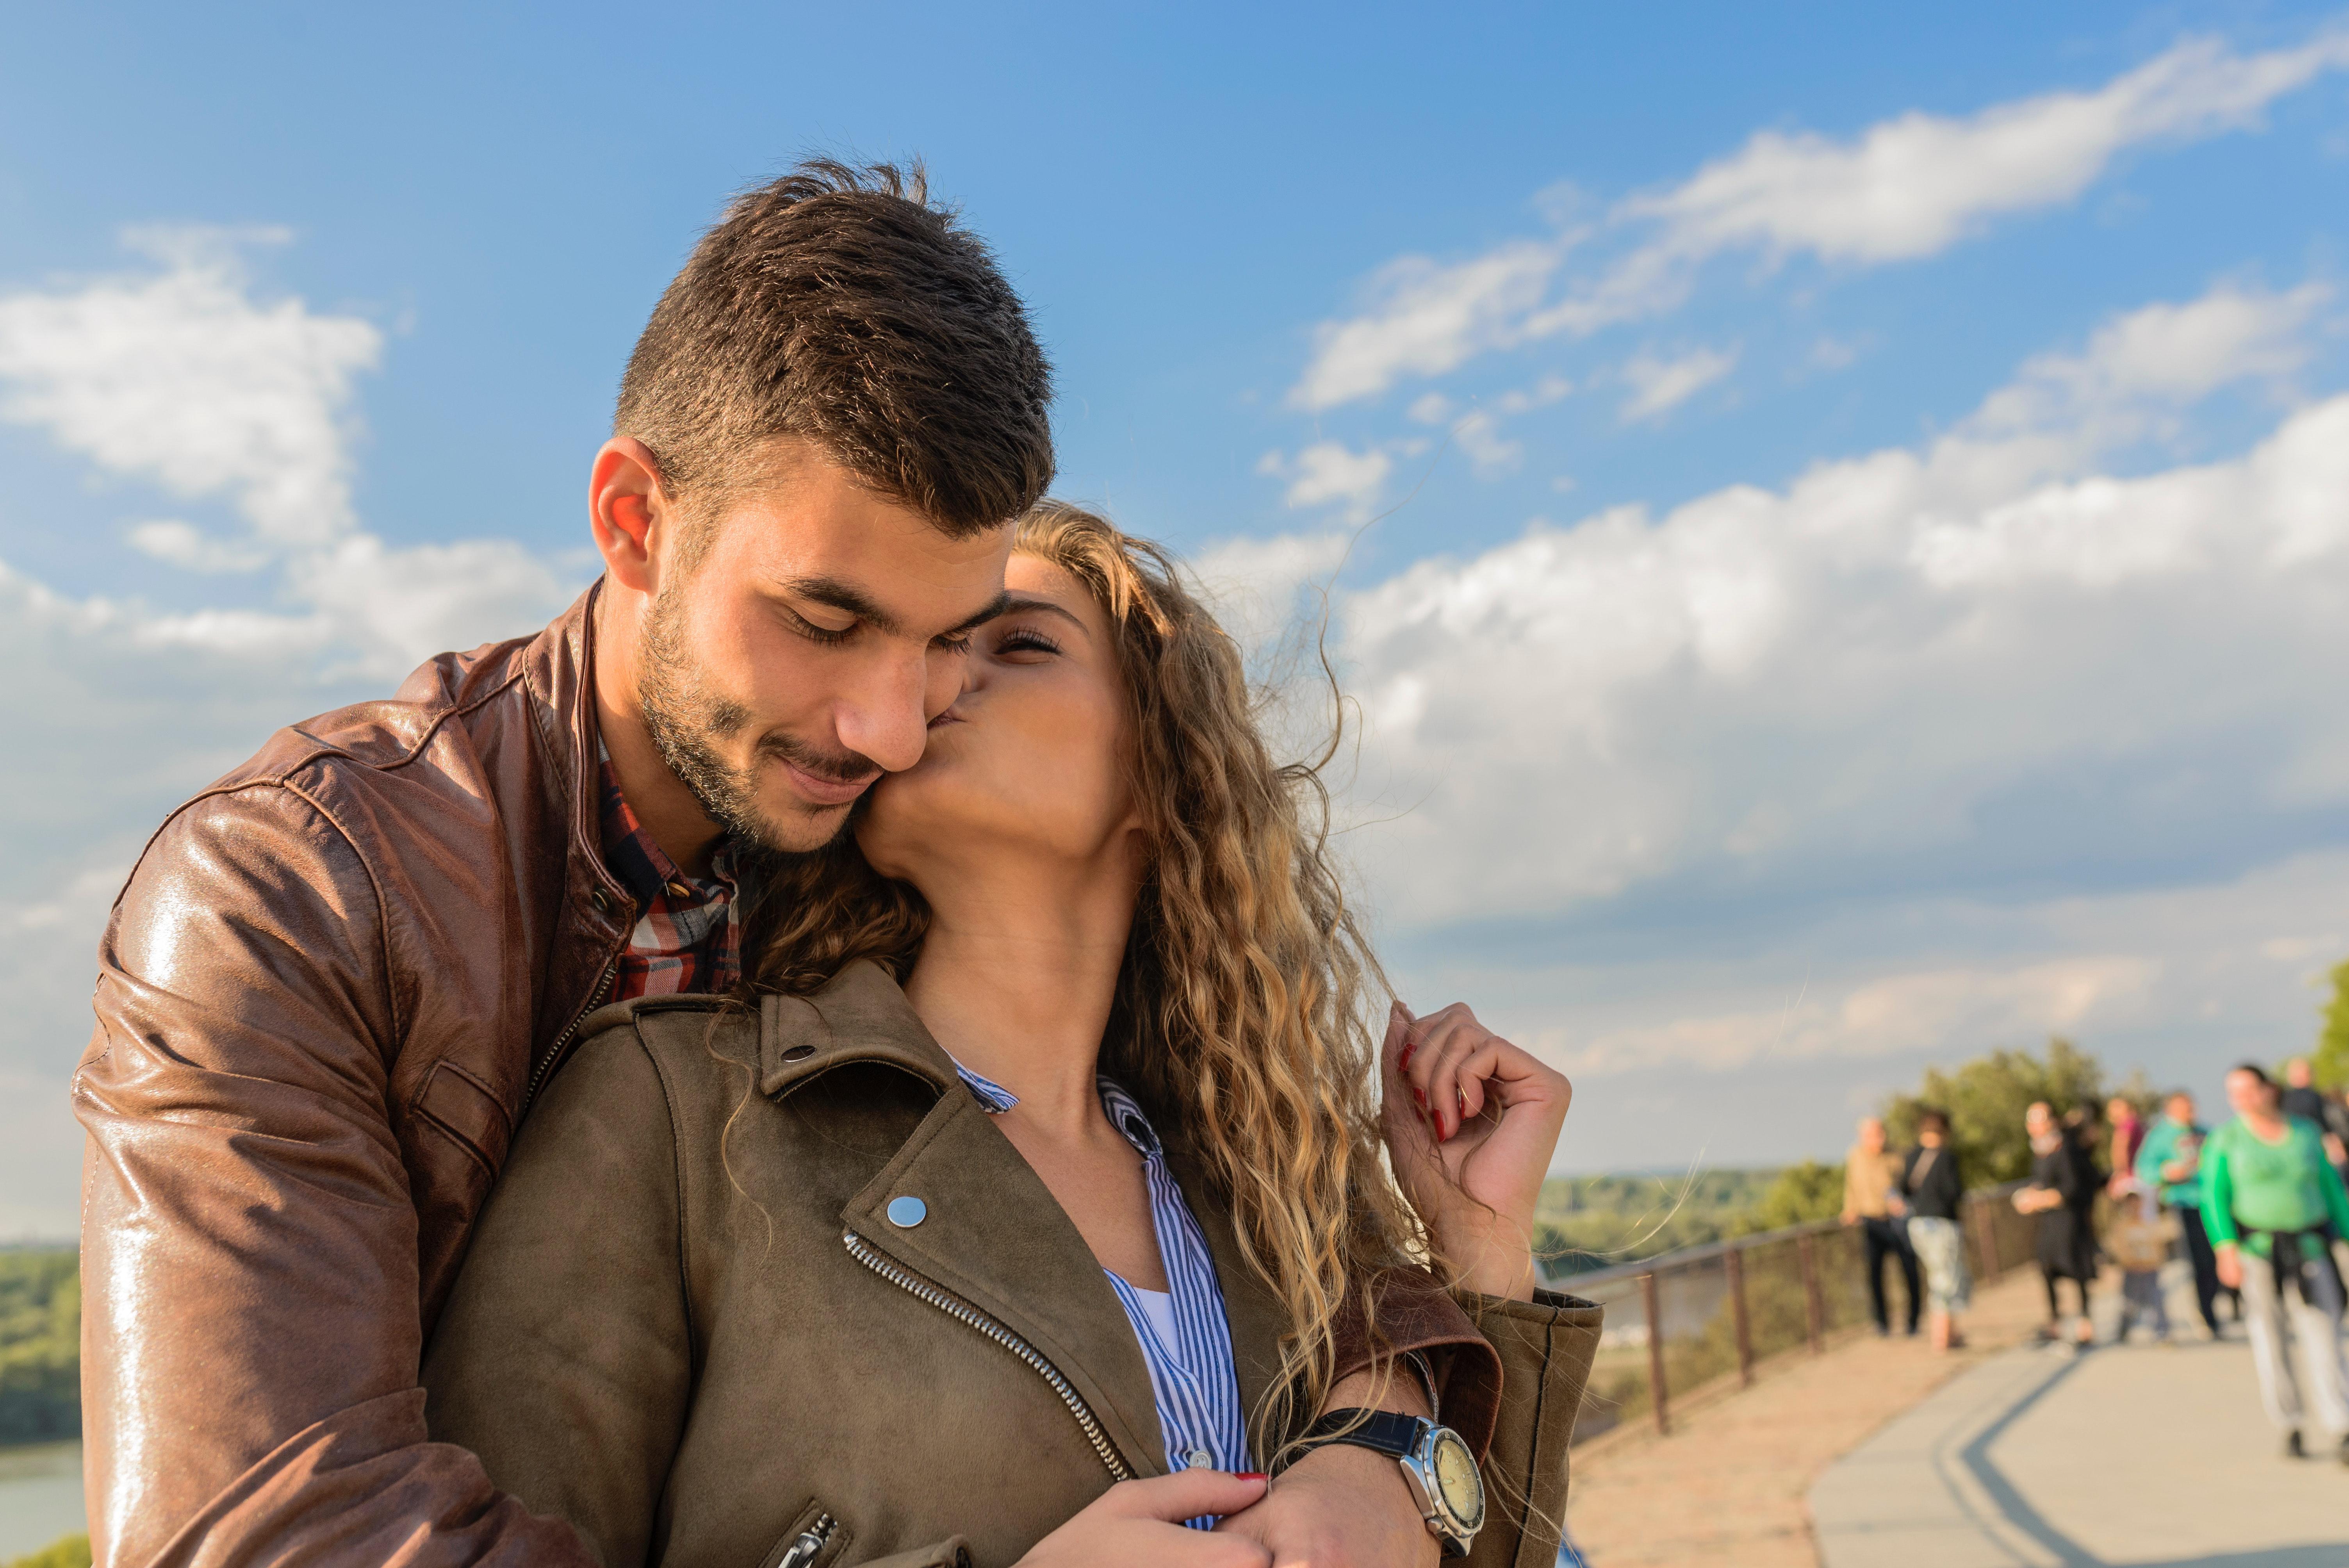 Pick szeged kielce online dating